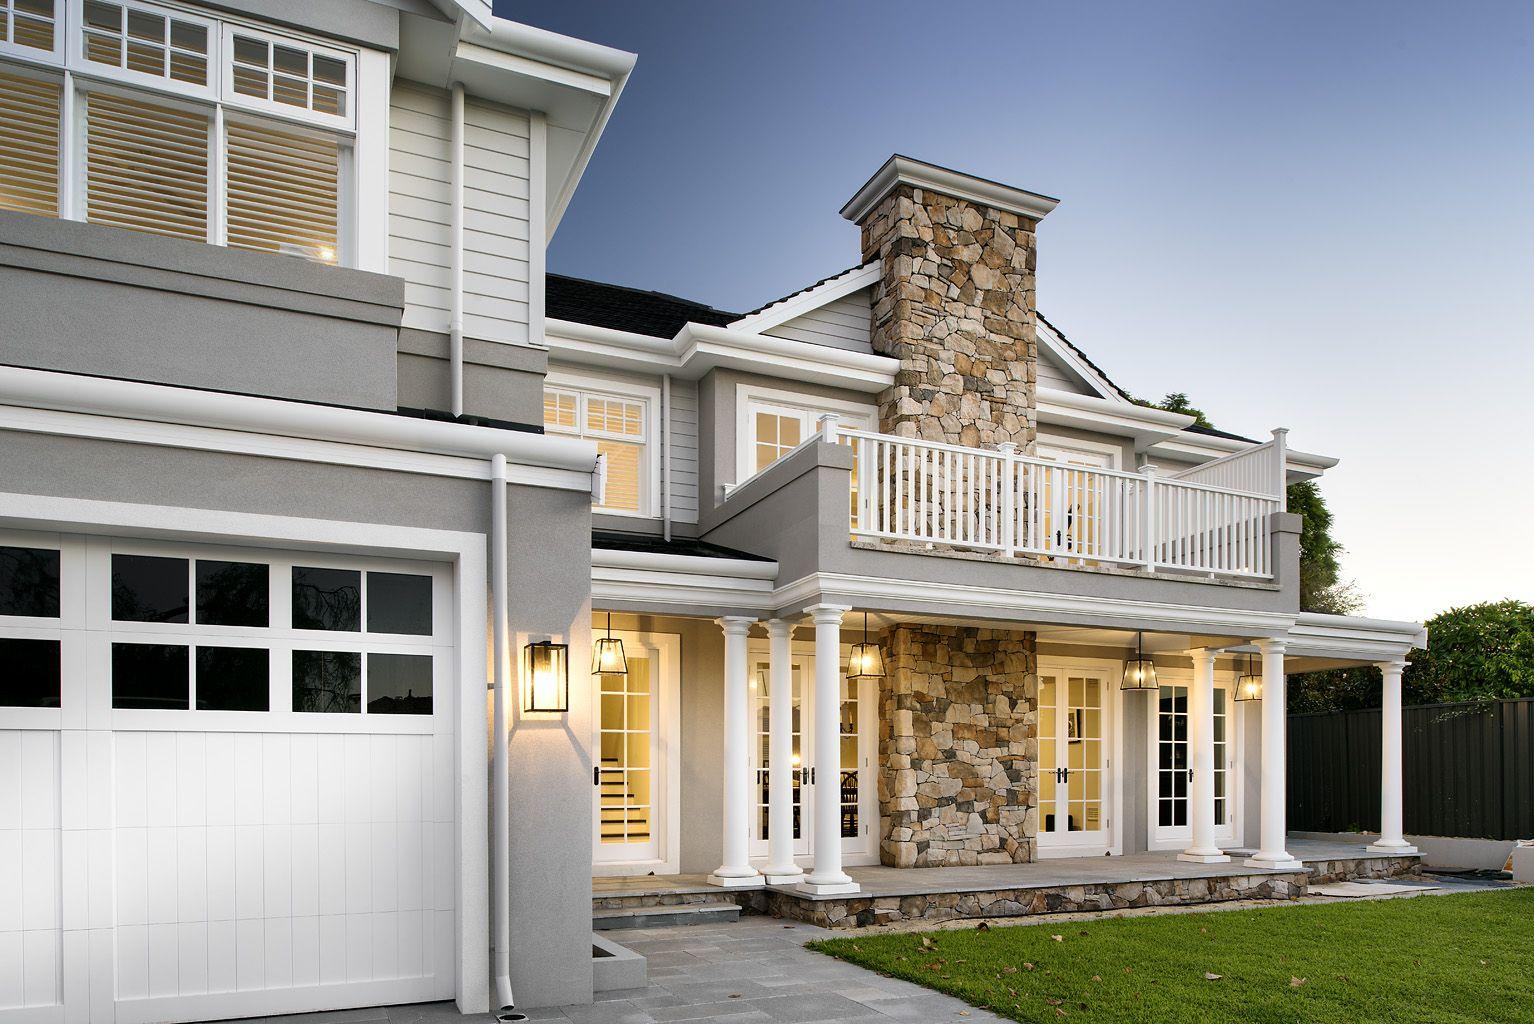 House Chimney Design chimney love   exteriors   pinterest   exterior, custom design and